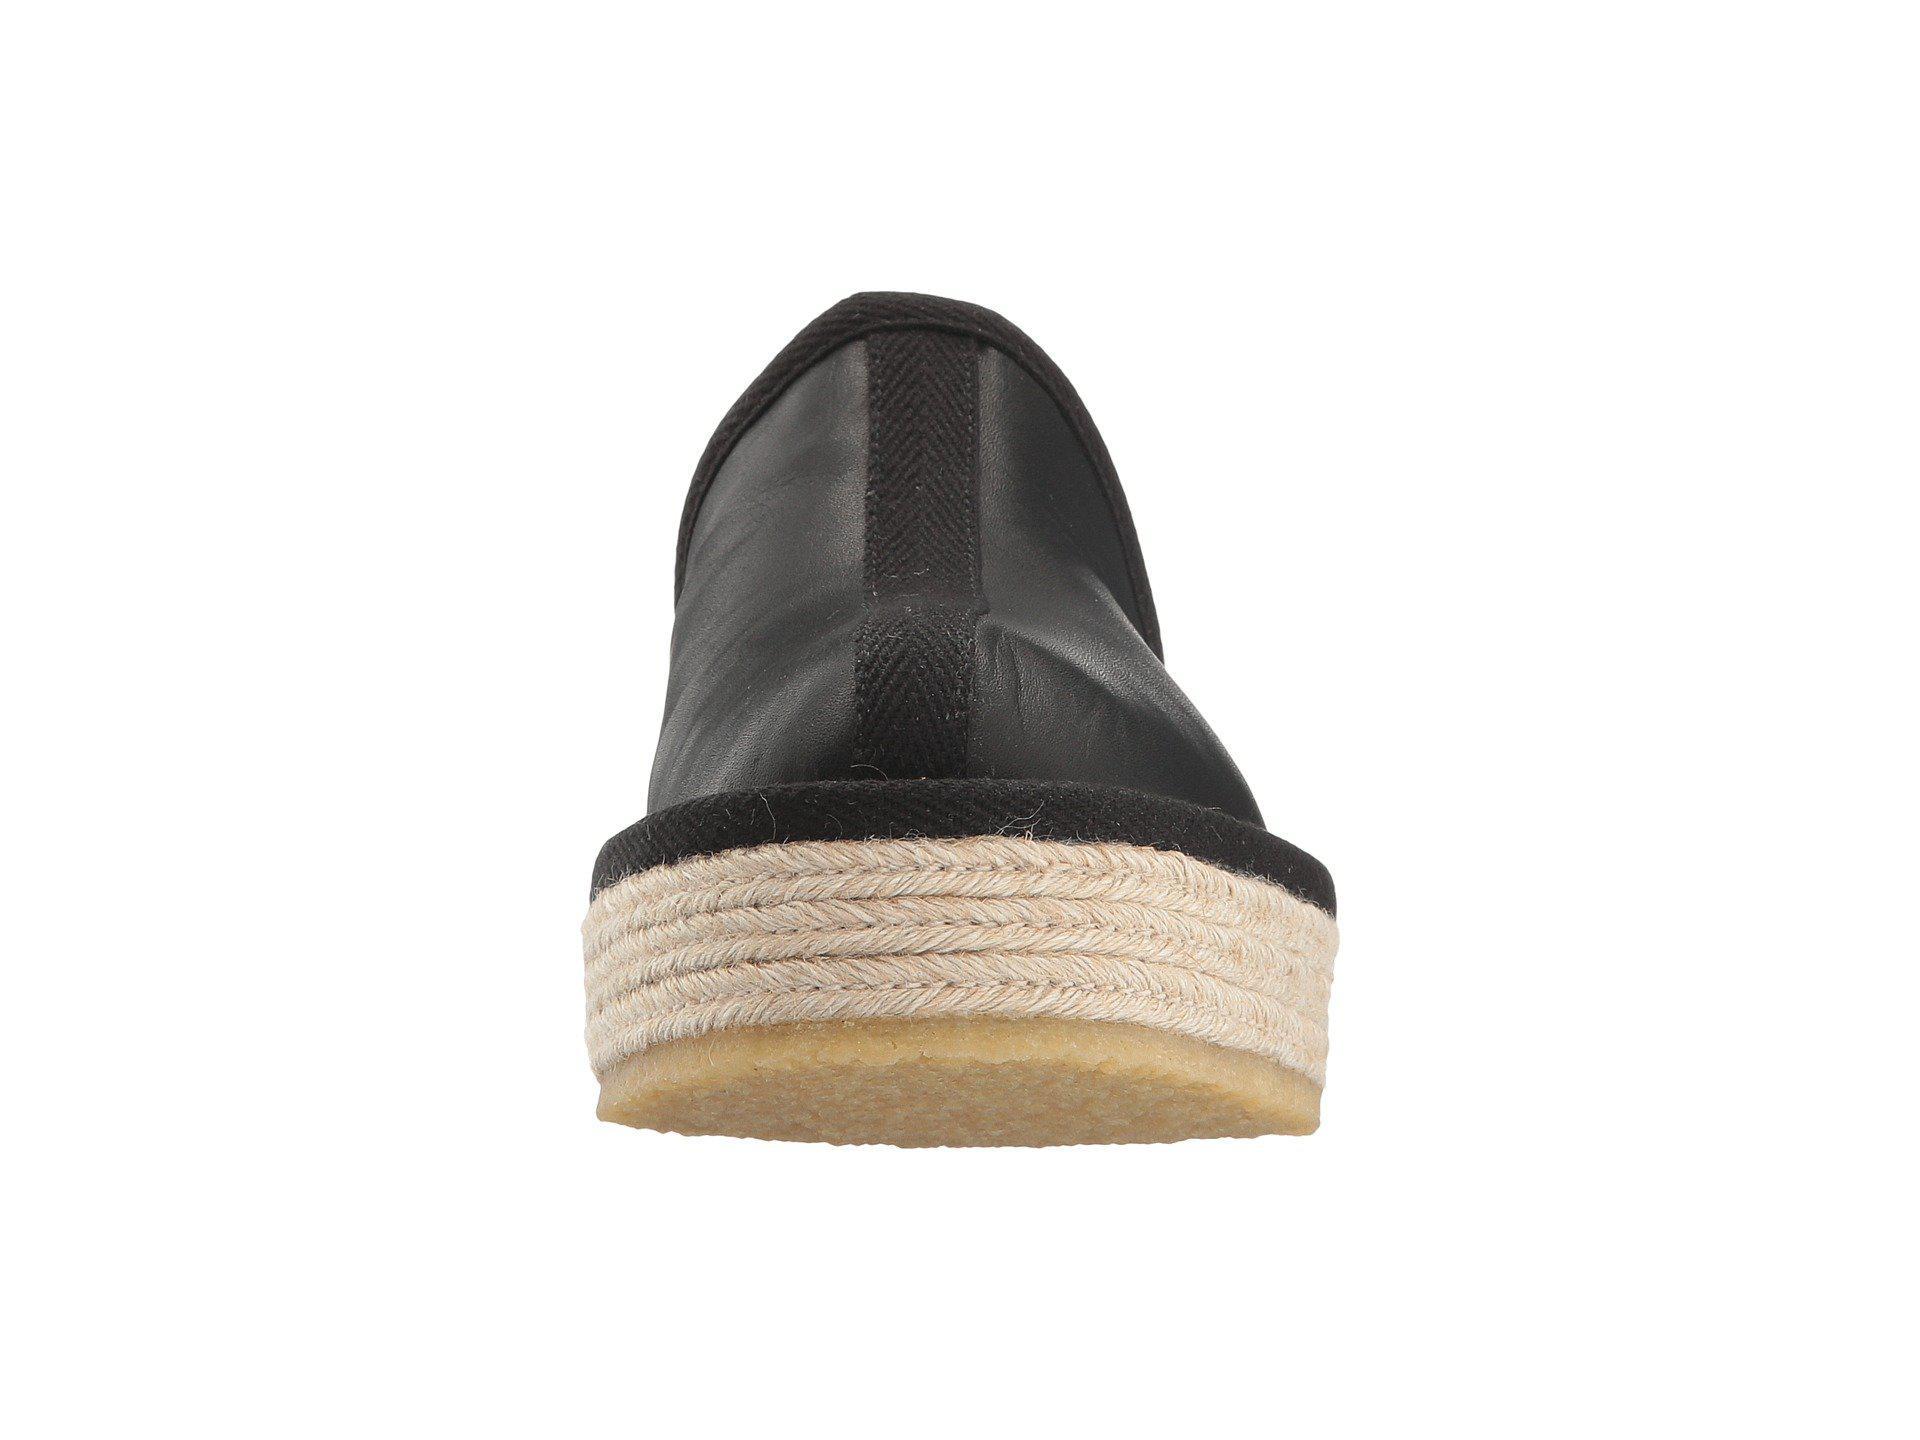 9edba3c6f Y s Yohji Yamamoto - Black Jute Sandals - Lyst. View fullscreen